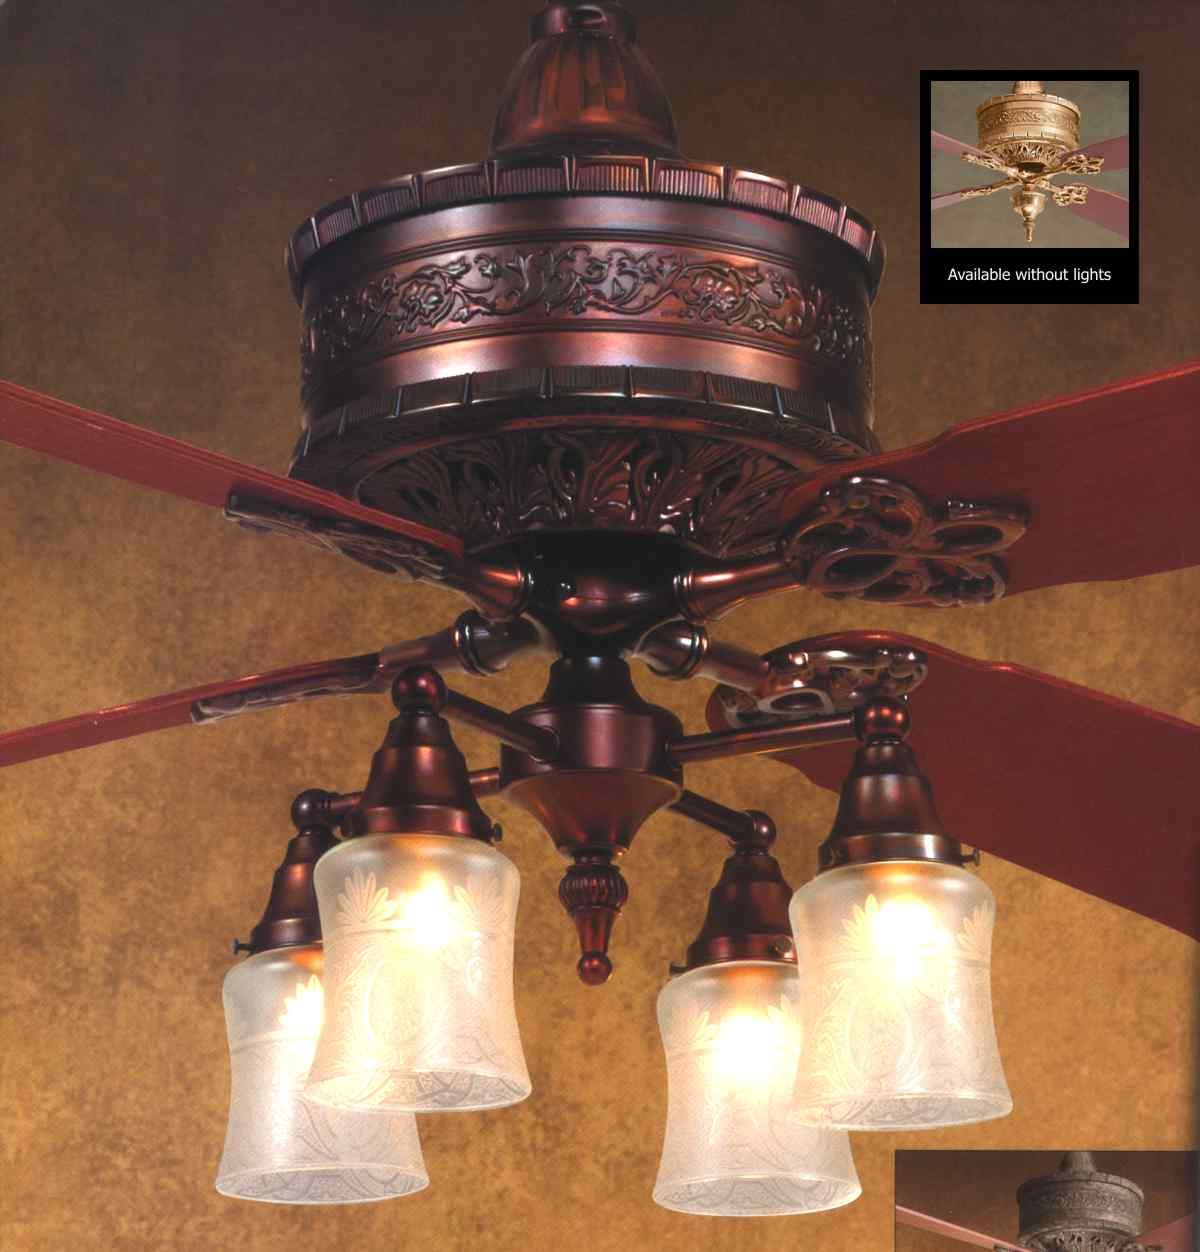 casablanca 19th century ceiling fan photo - 10